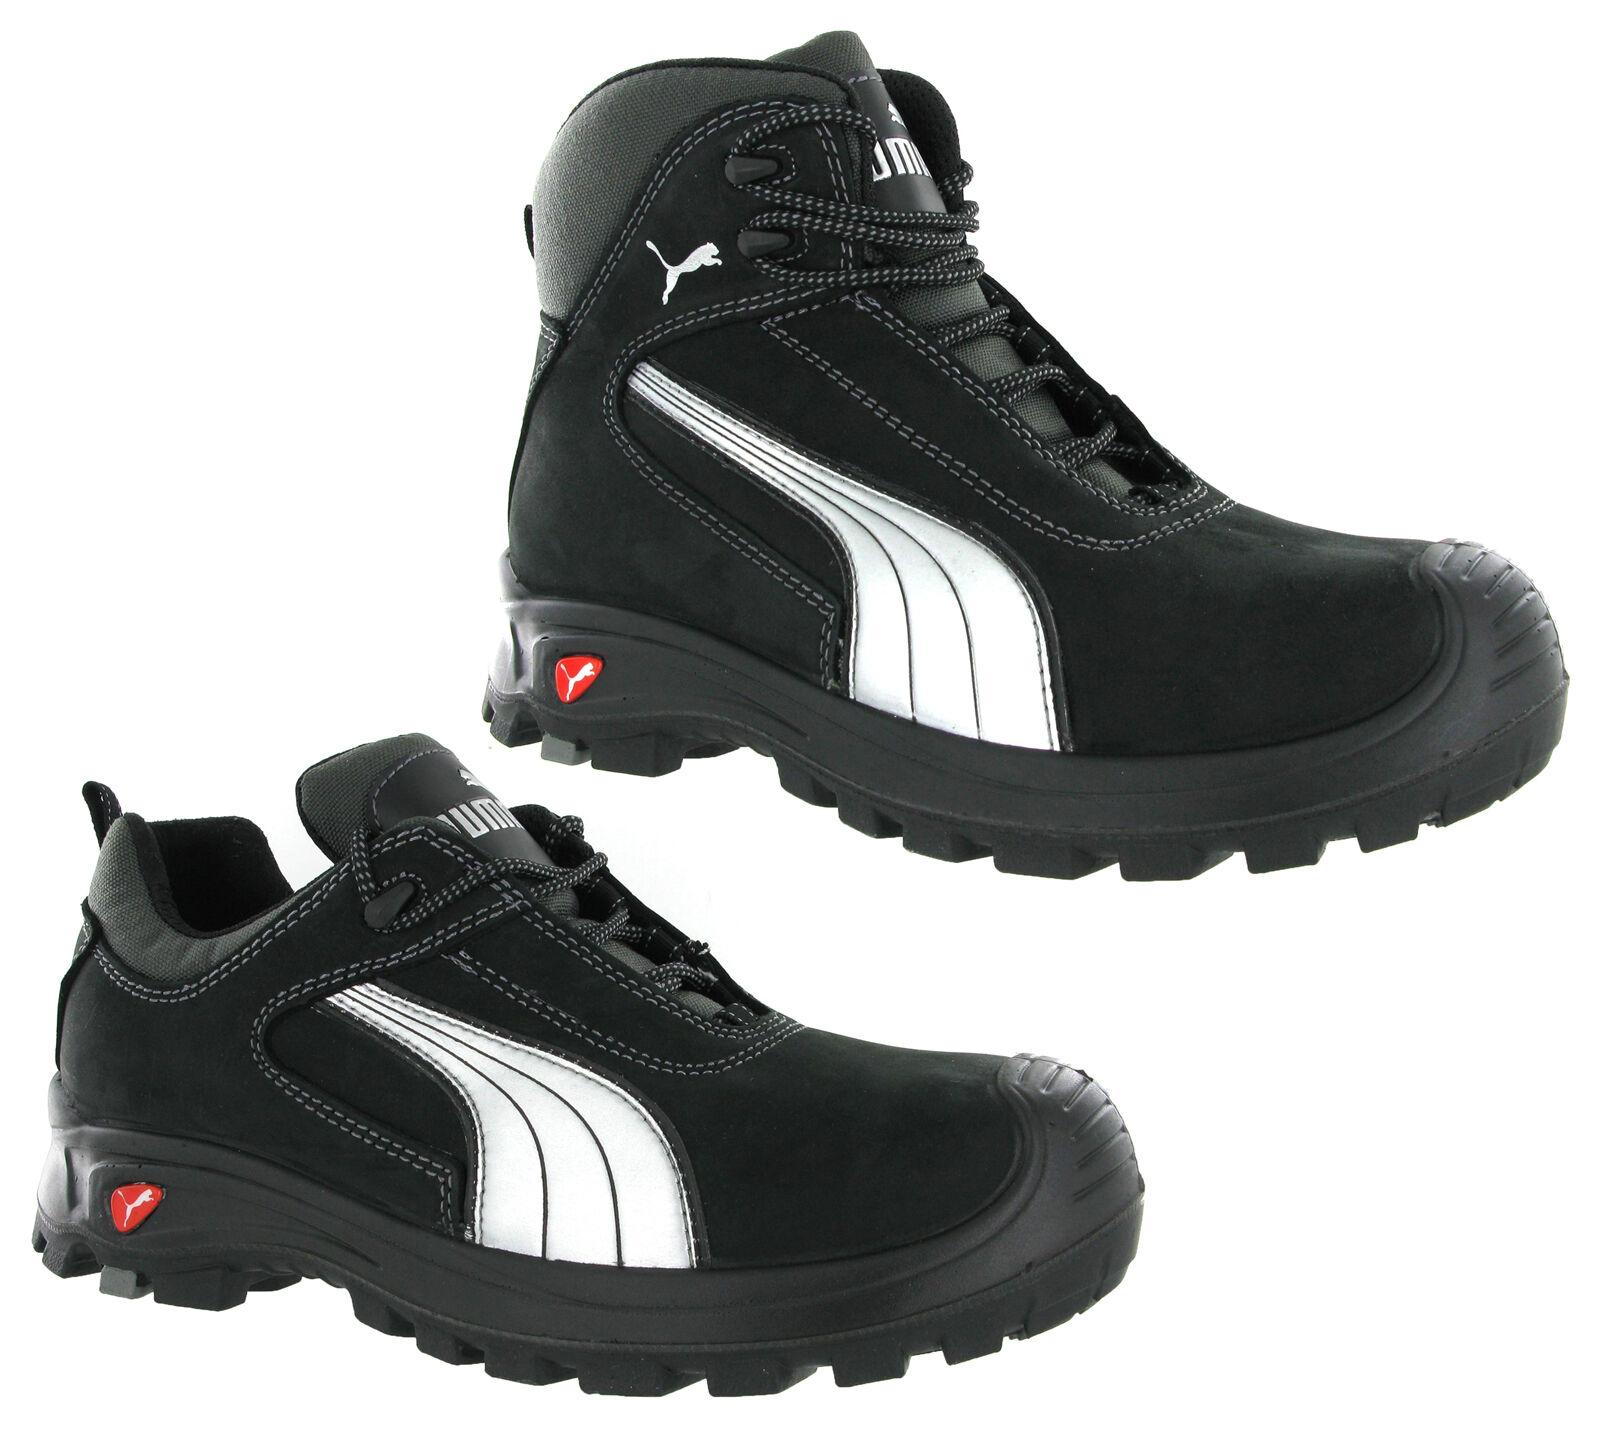 ffd93bc33223d Puma Cascades Mid Low Black S3 Safety Midsole Toe Cap Mens Trainers Shoes  Boots